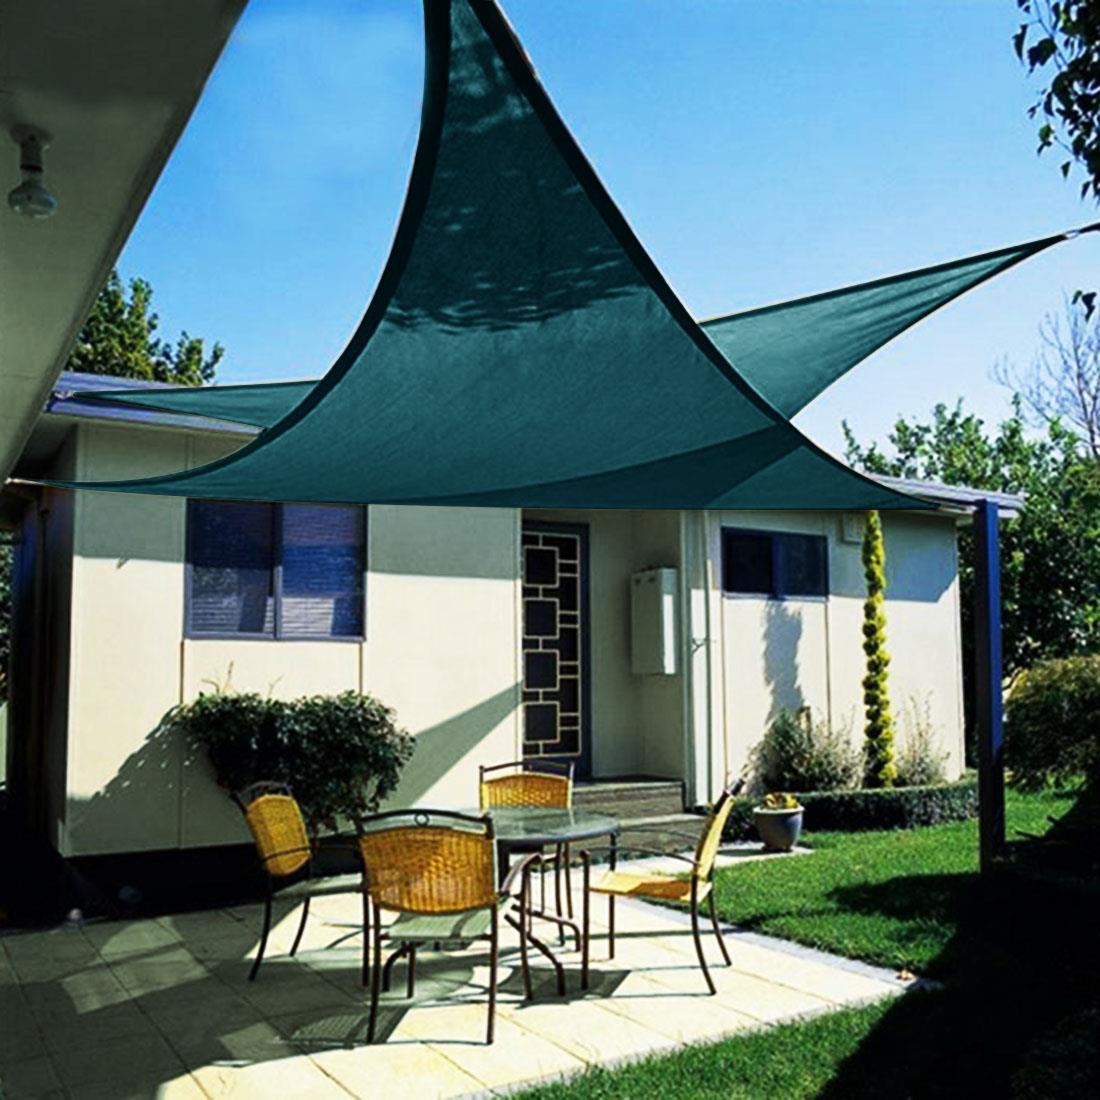 Backyard Sails Shades: Quictent 12/18/20 FT Triangle Sun Shade Sail Patio Pool